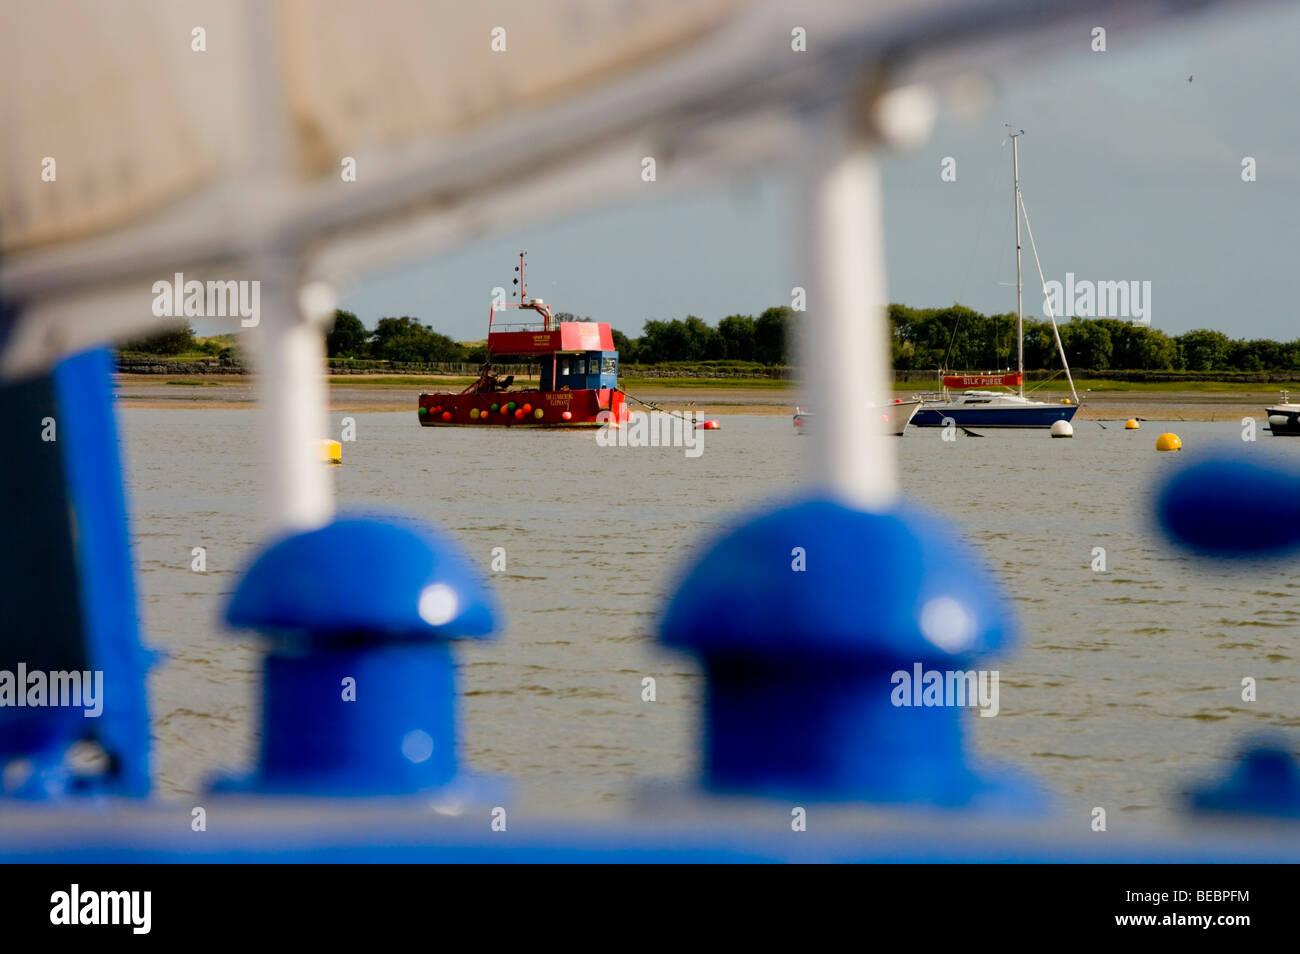 europe, uk, england, devon, Exe estuary - Stock Image